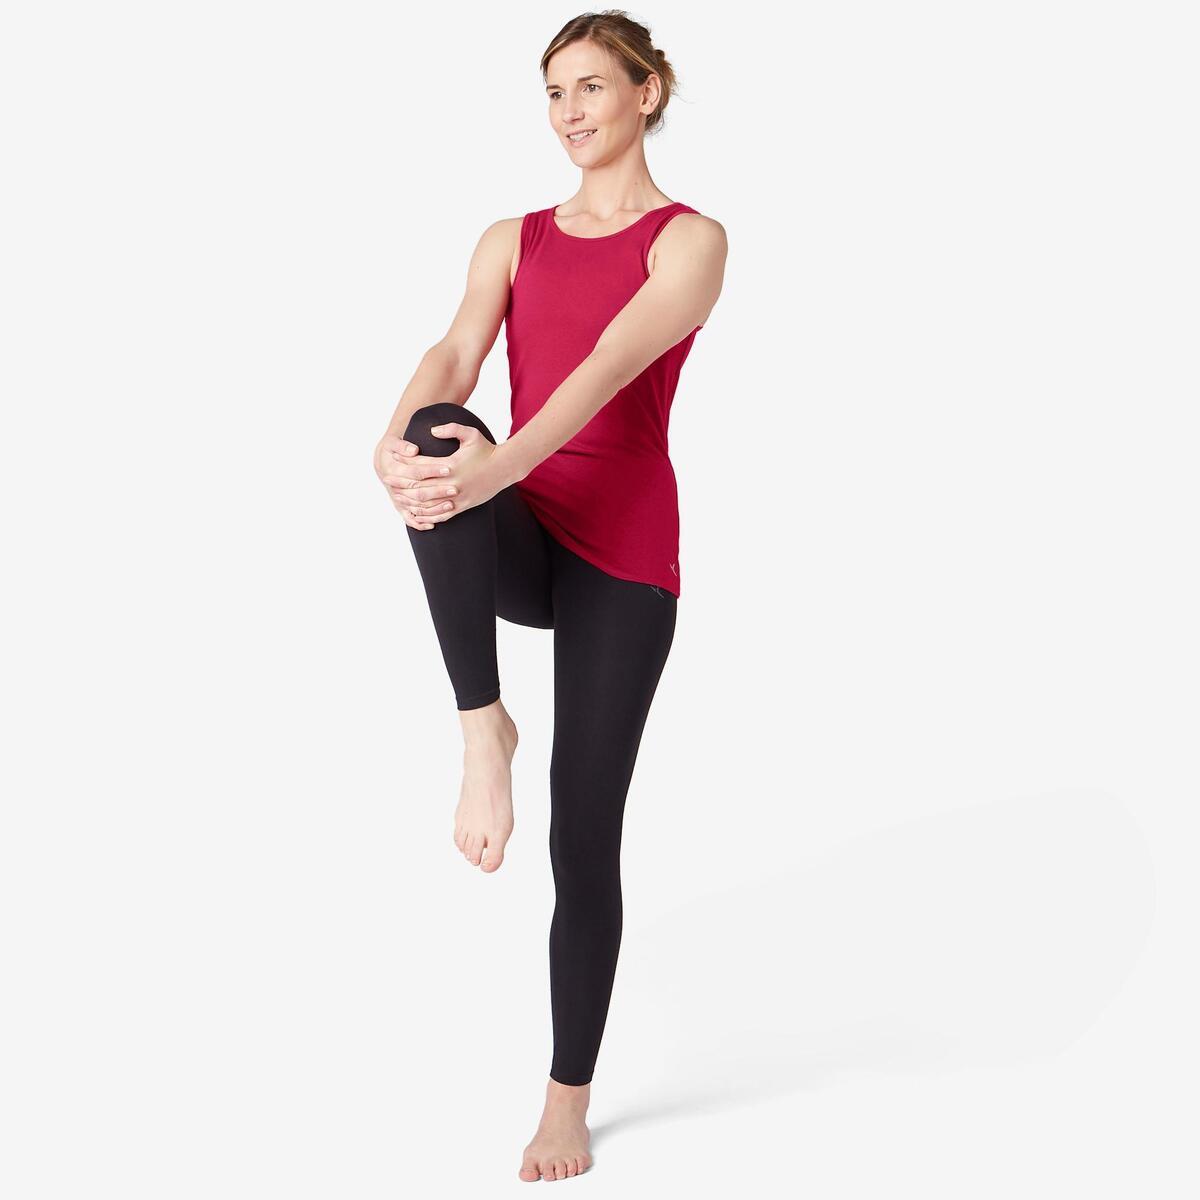 Bild 3 von Tank-Top 500 Pilates & sanfte Gymnastik Damen bordeaux meliert